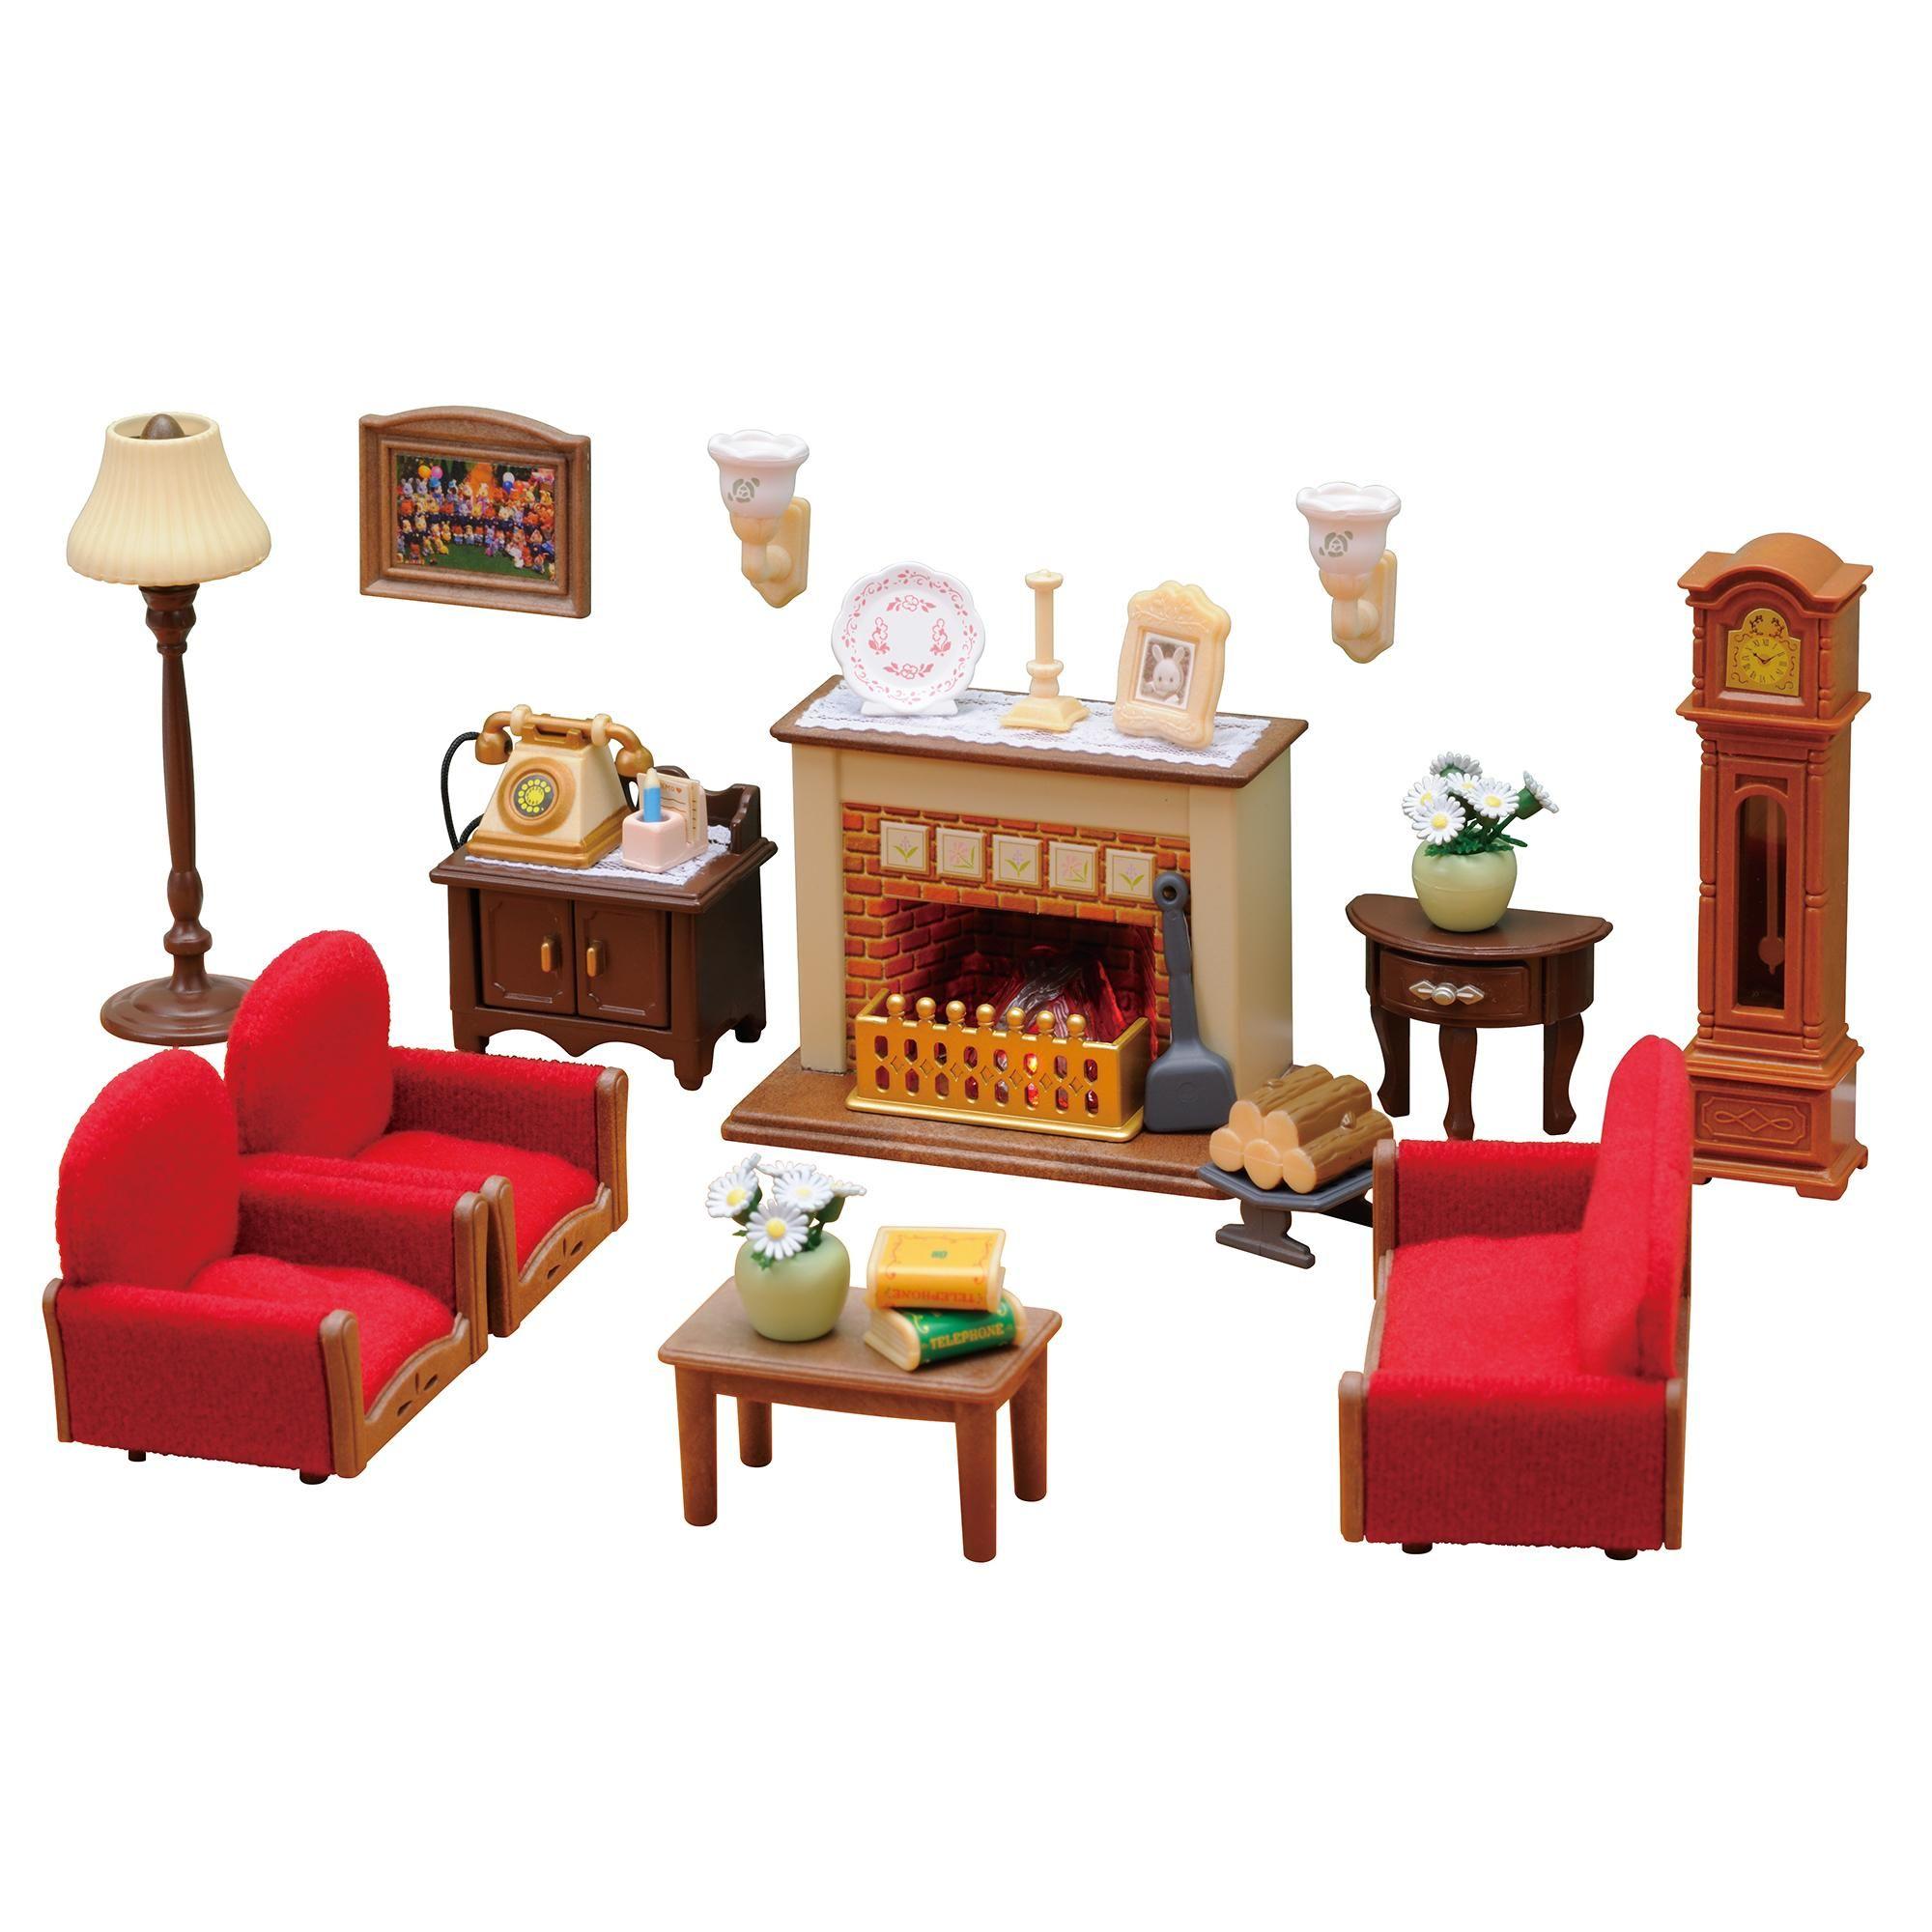 Sylvanian Families Luxury Living Room, Luxury Living Room Set Sylvanian Families